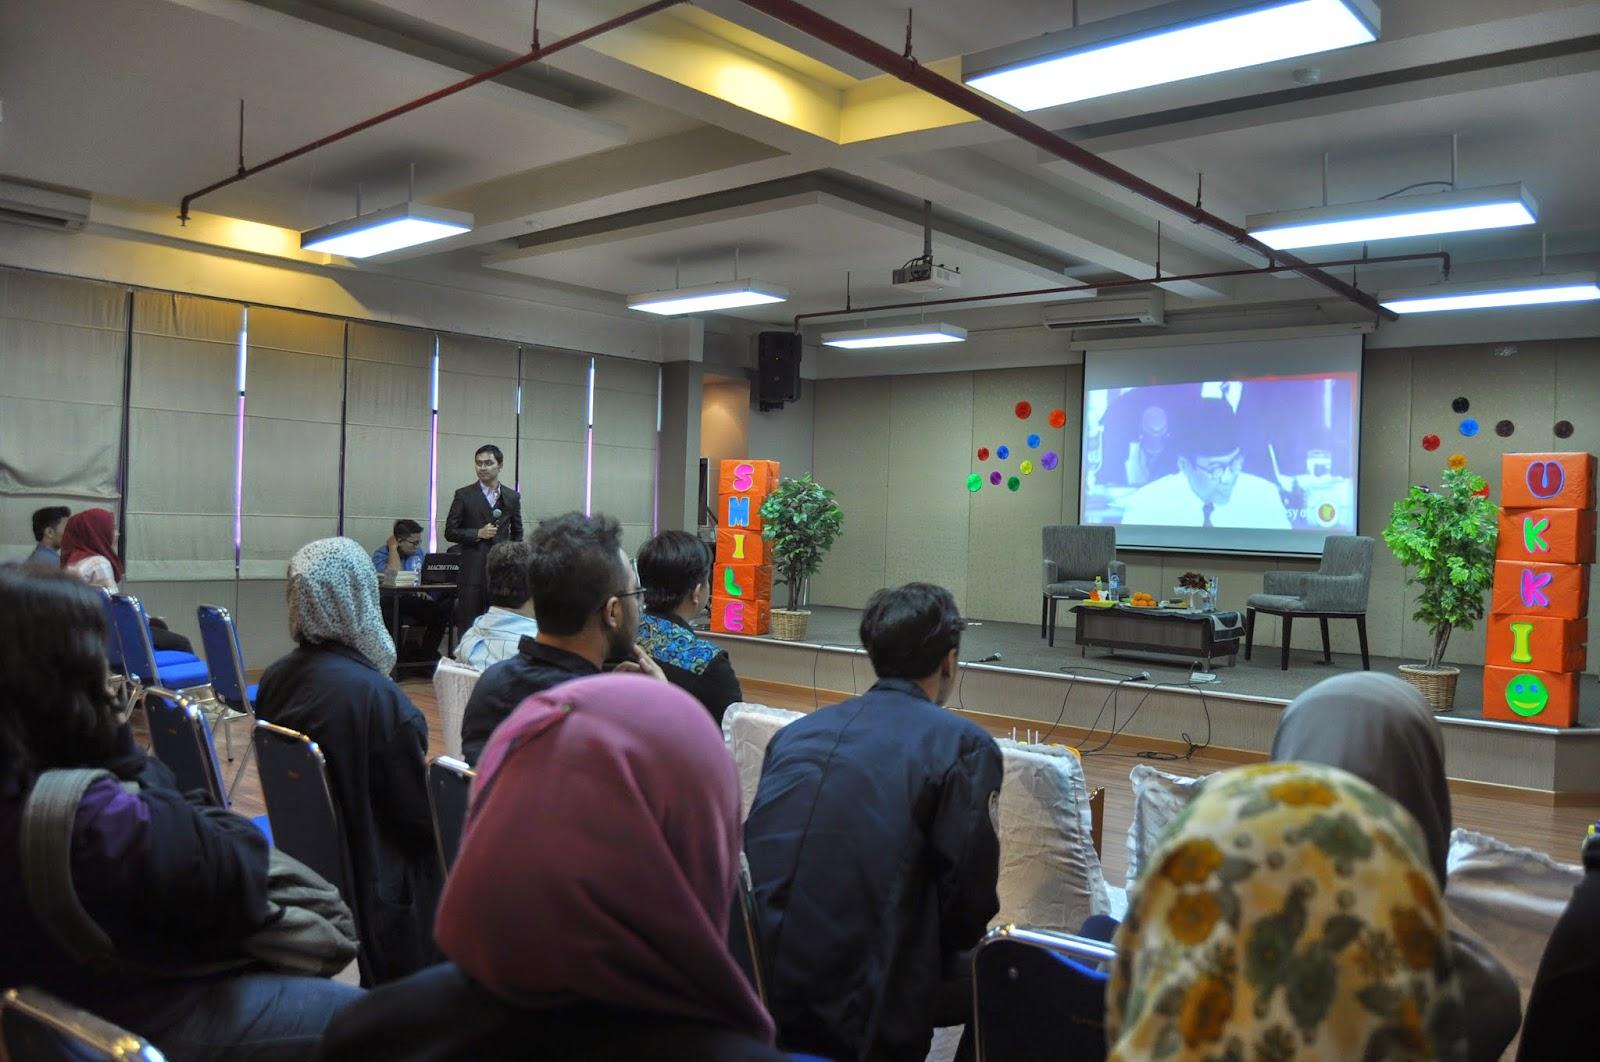 edvan m kautsar, edvan muhammad kautsar, motivator indonesia, Motivator Muda, motivator nasional, motivator terbaik, motivator wirausaha, training motivasi, trainer motivasi